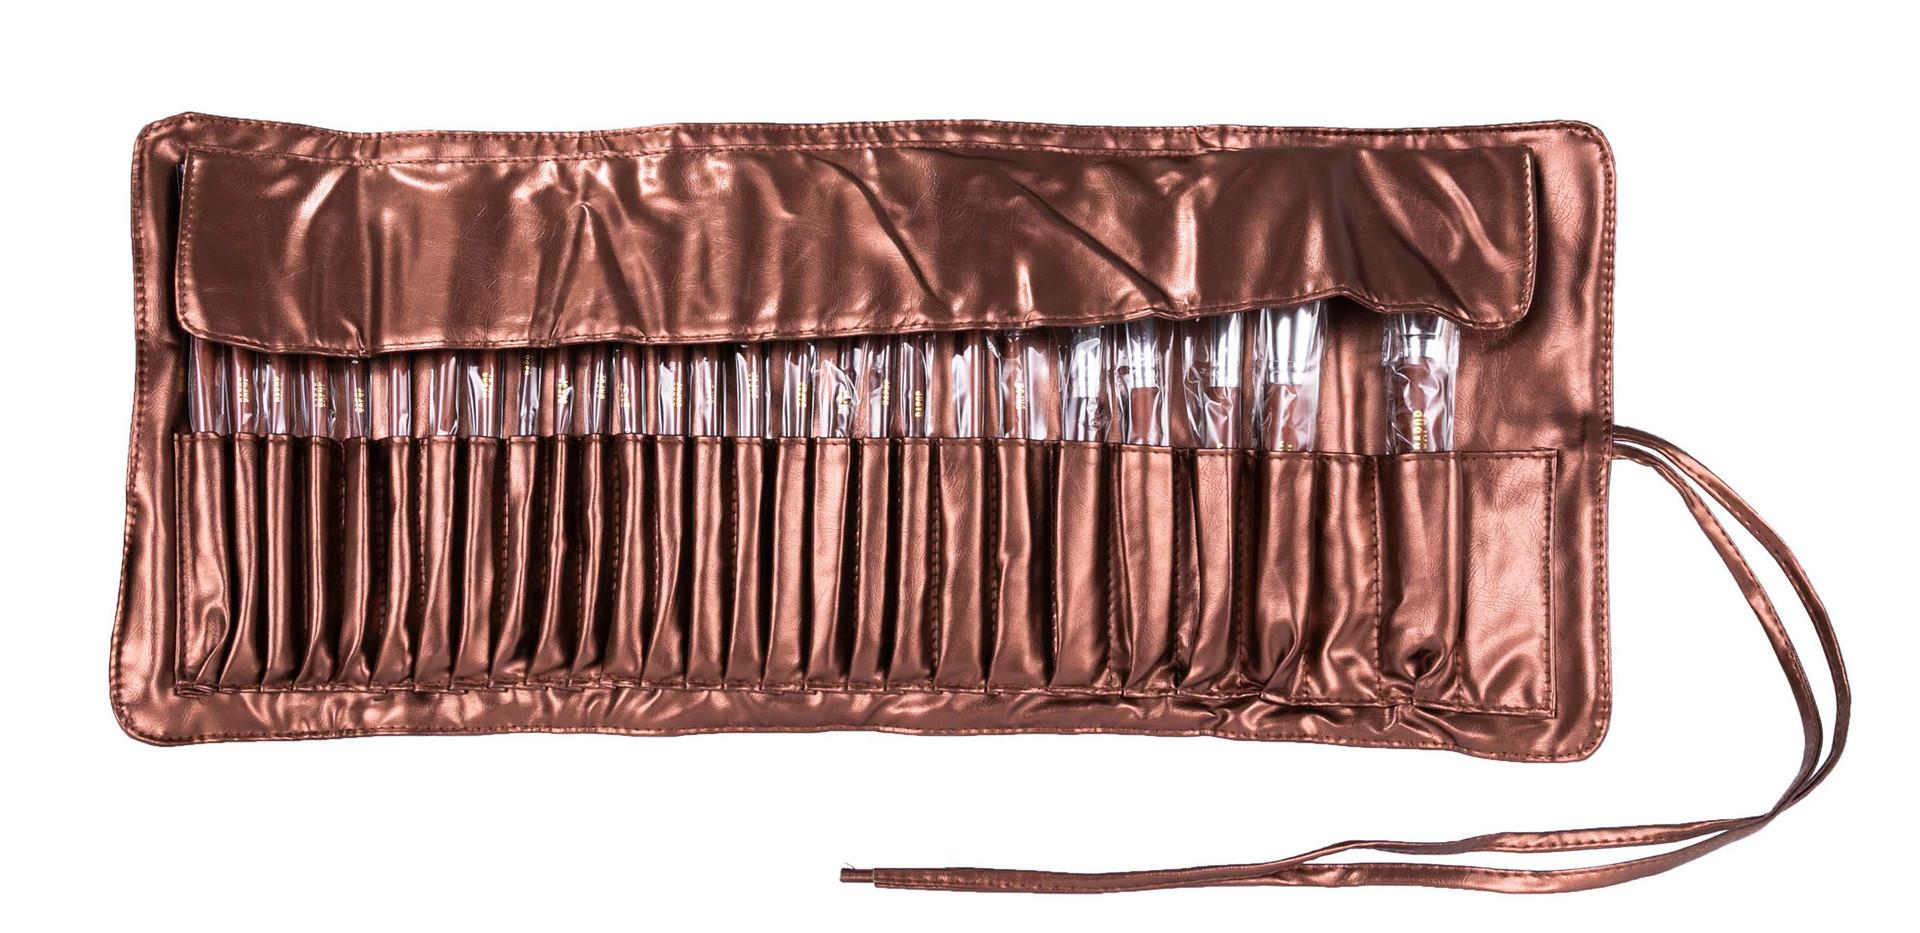 Kit de Pincéis Brown com 26 Peças Dapop - HB96696 (4)